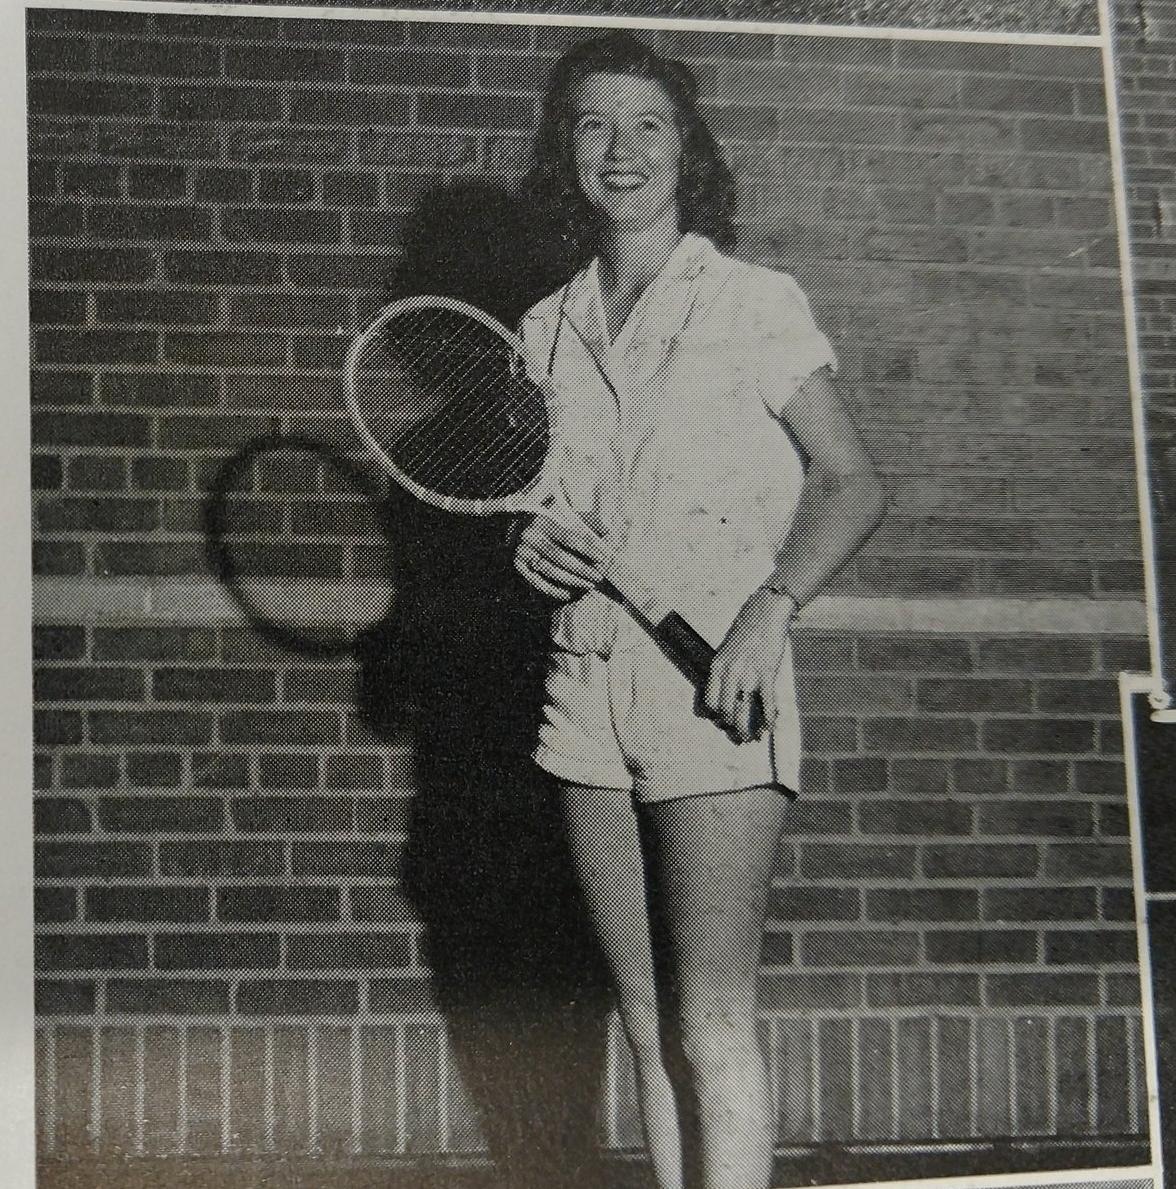 Copy of Peggy Vilbig - Tennis singles champ